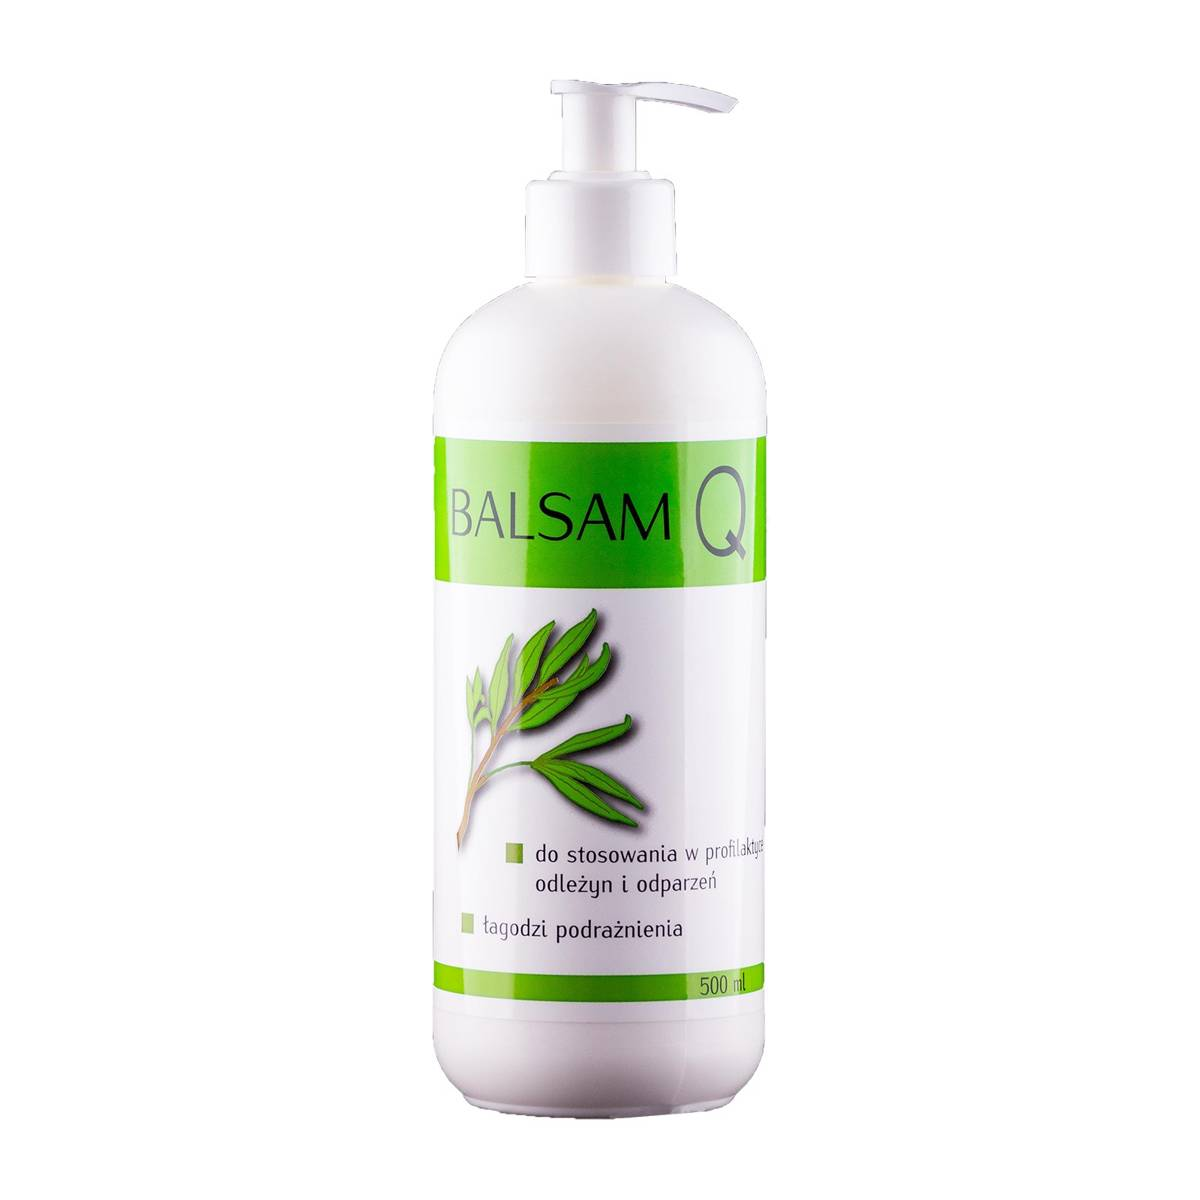 India Balsam Q 500 ml drzewo herbaciane lawenda